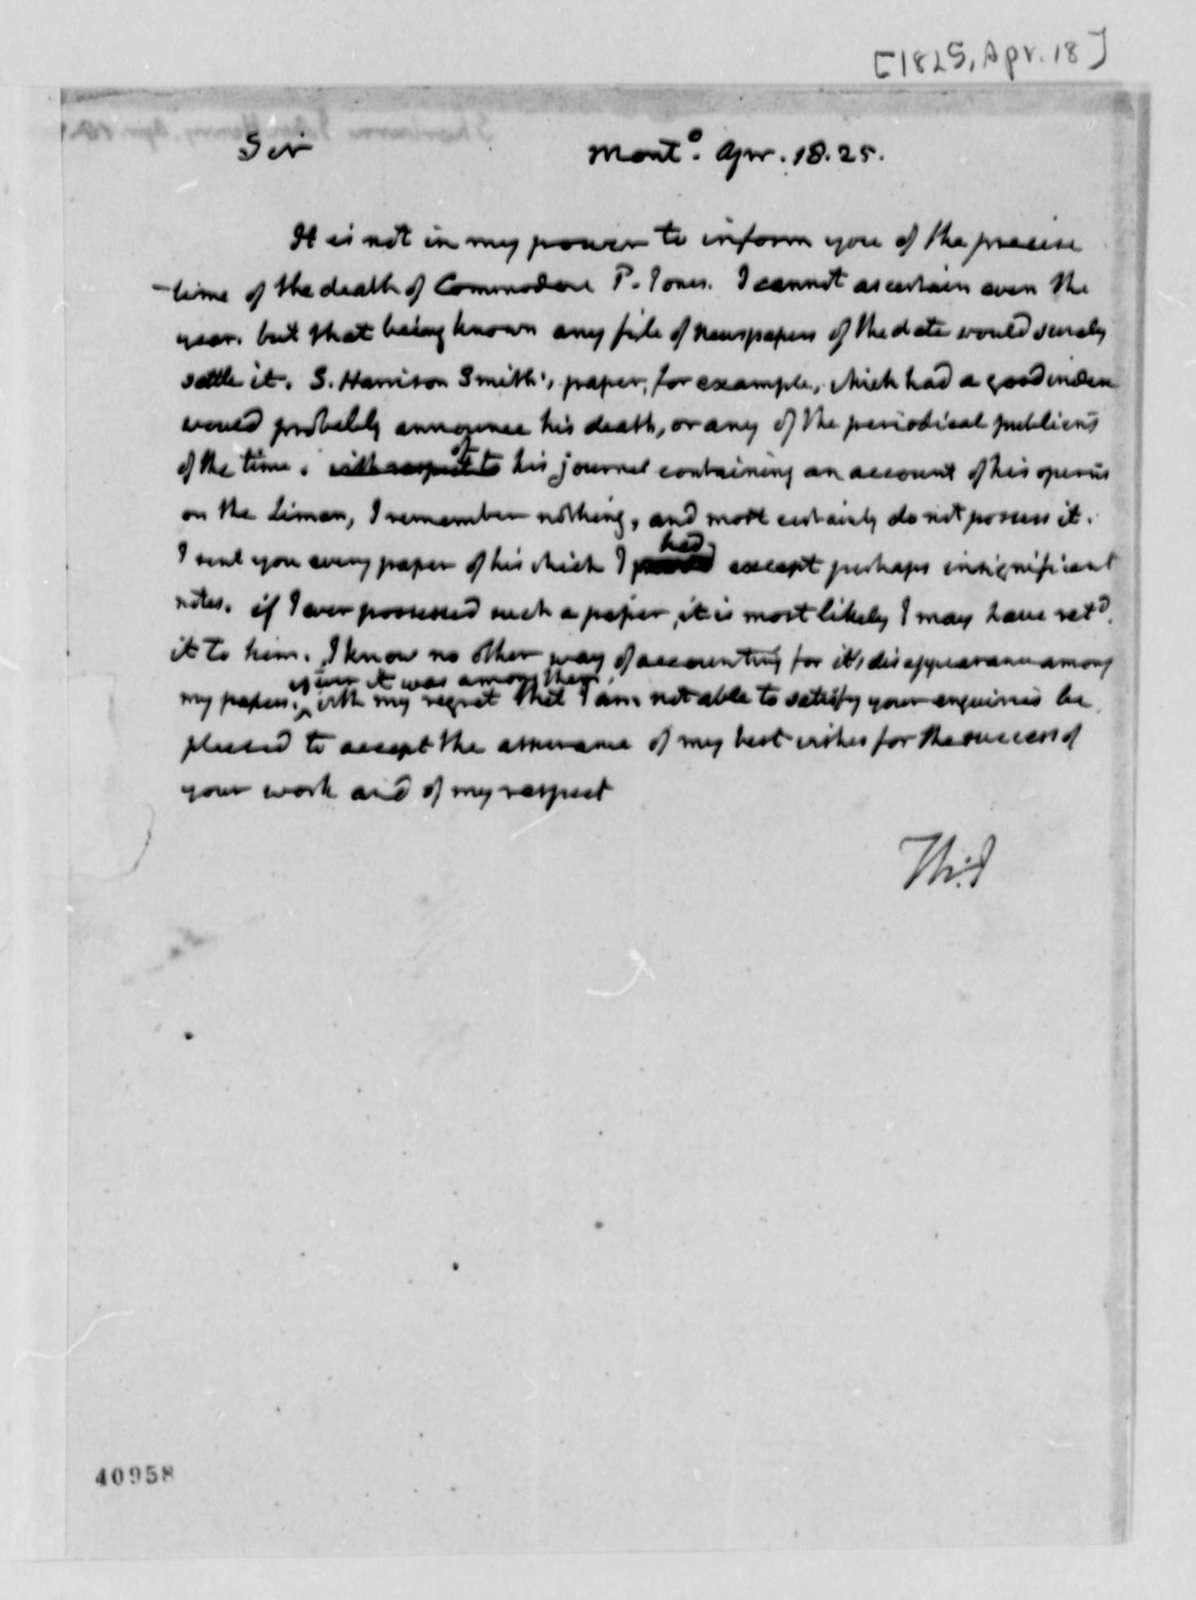 Thomas Jefferson to John Henry Sherburne, April 18, 1825